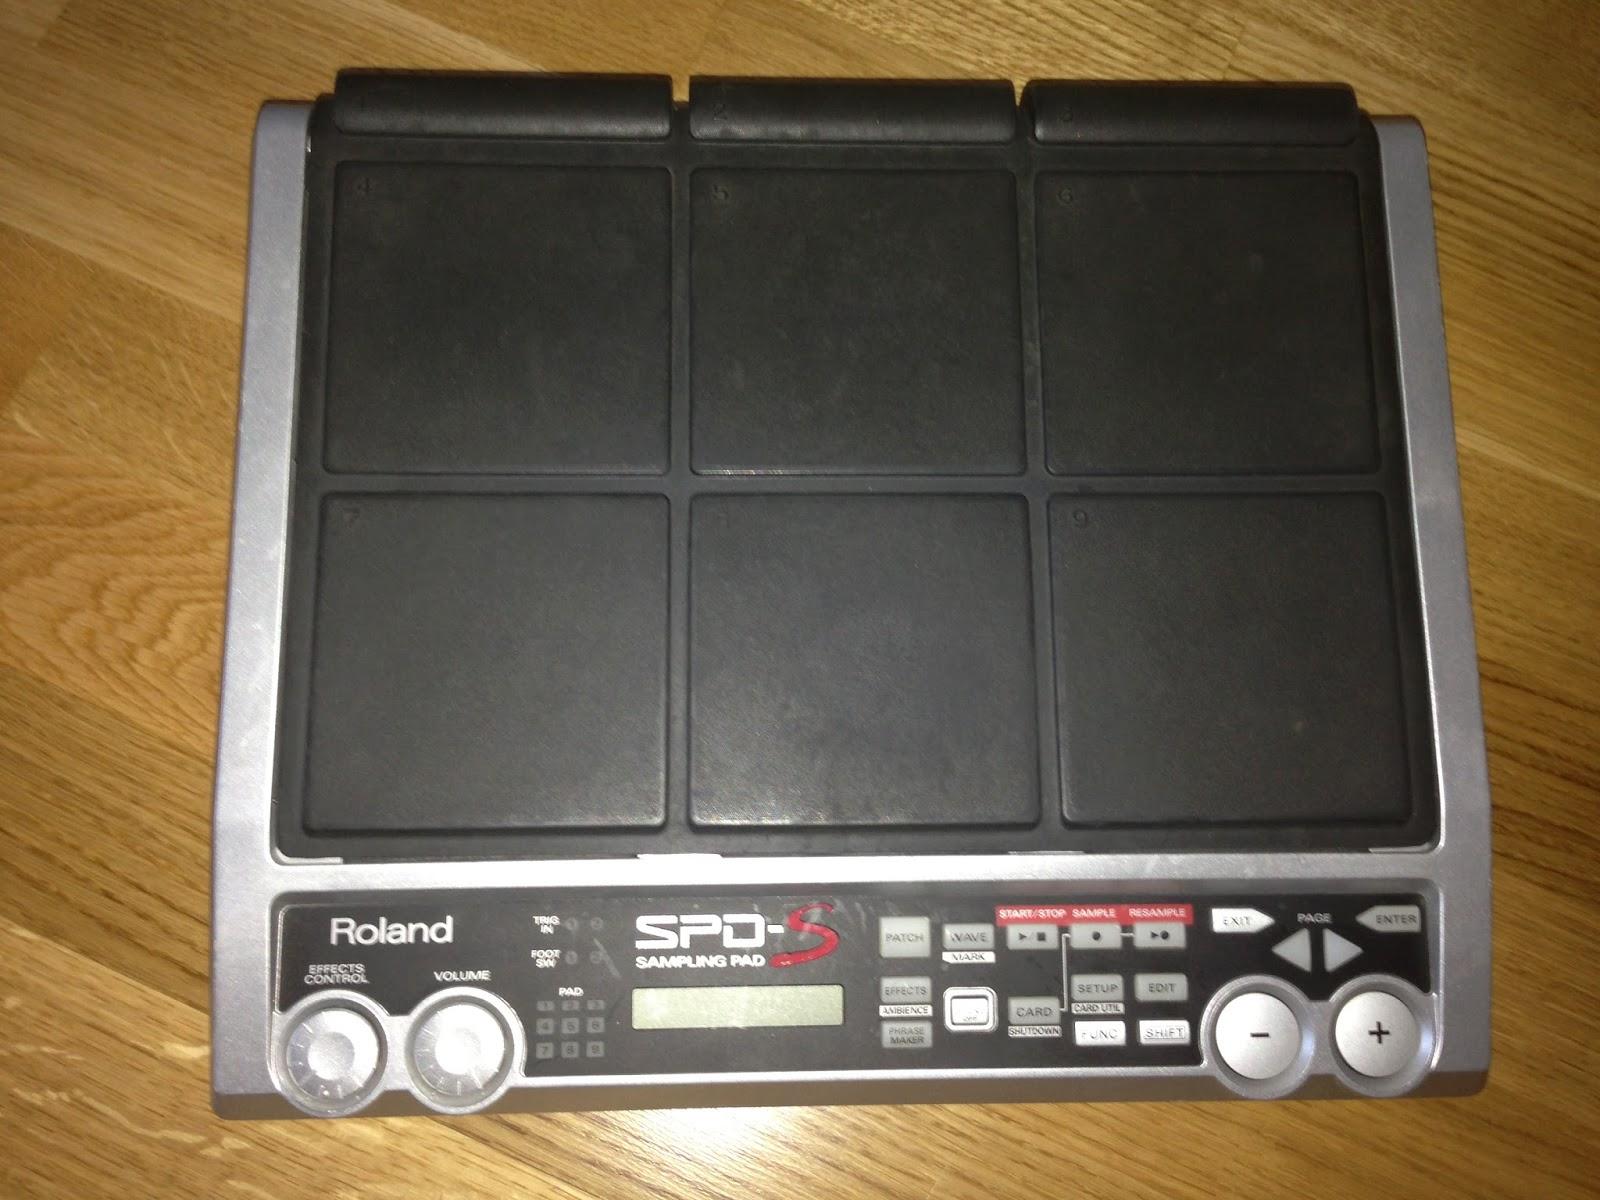 Roland Spd 30 Sample Pack | Free Download | - Dj VamPire Mix